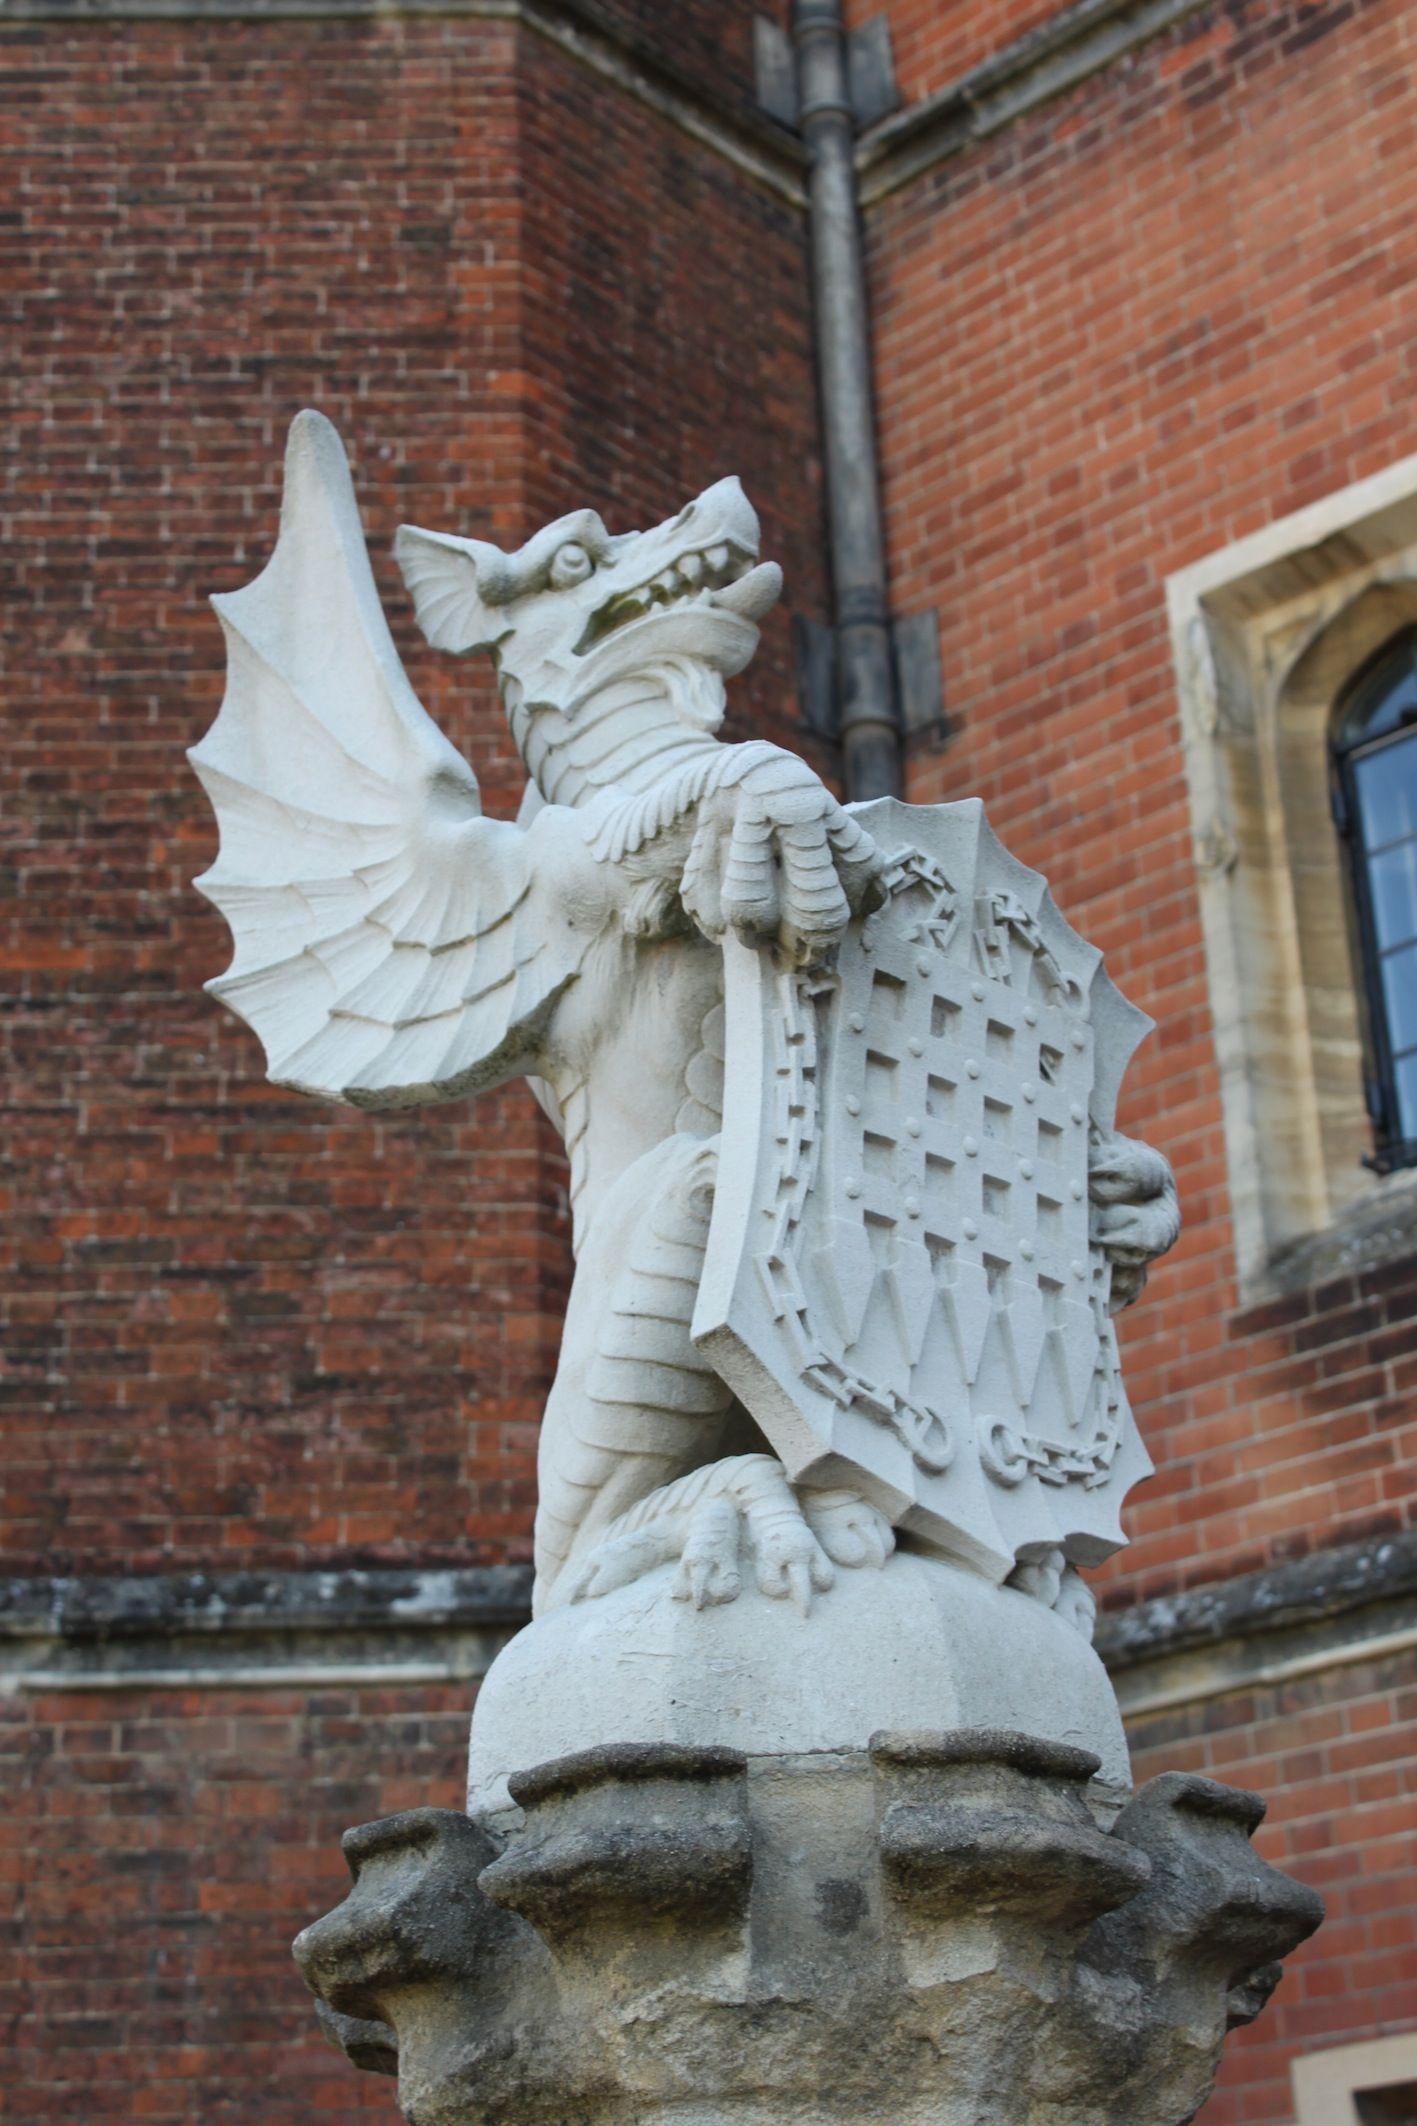 The Tudor Dragon